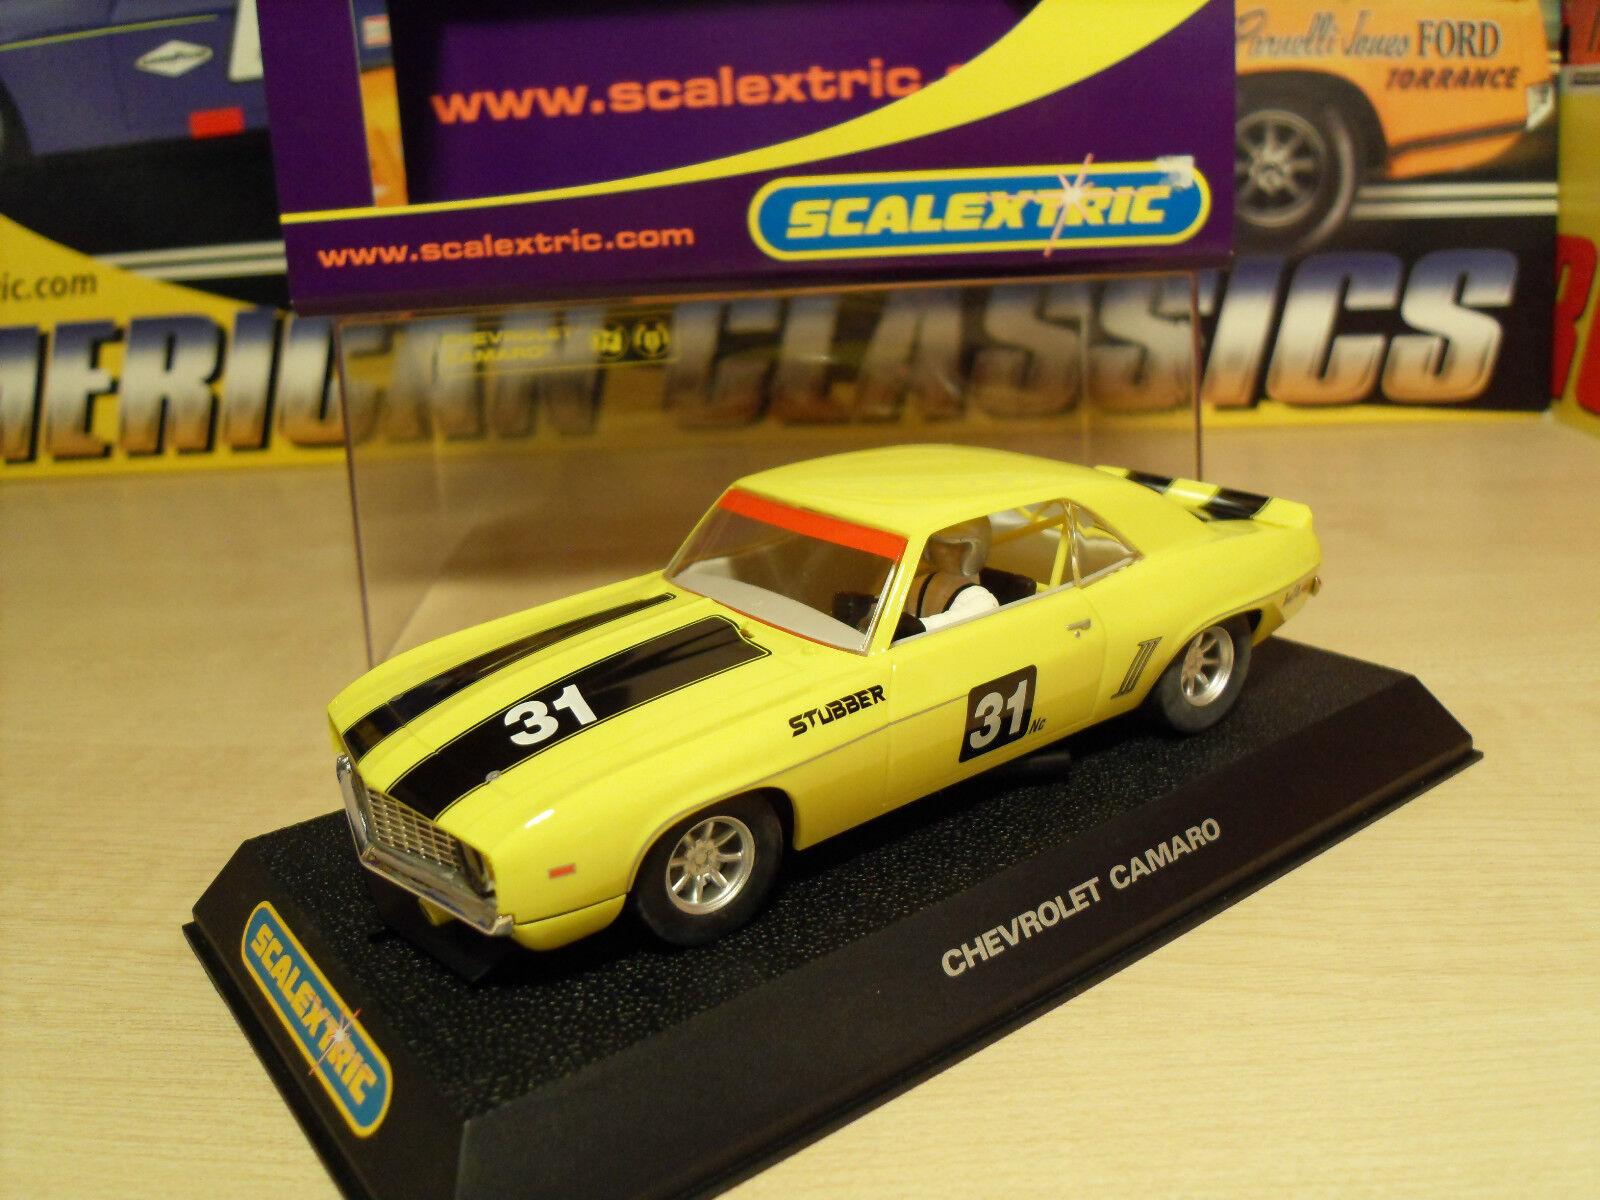 Scalextric C2759 Camaro Stubber - Brand New in Box.